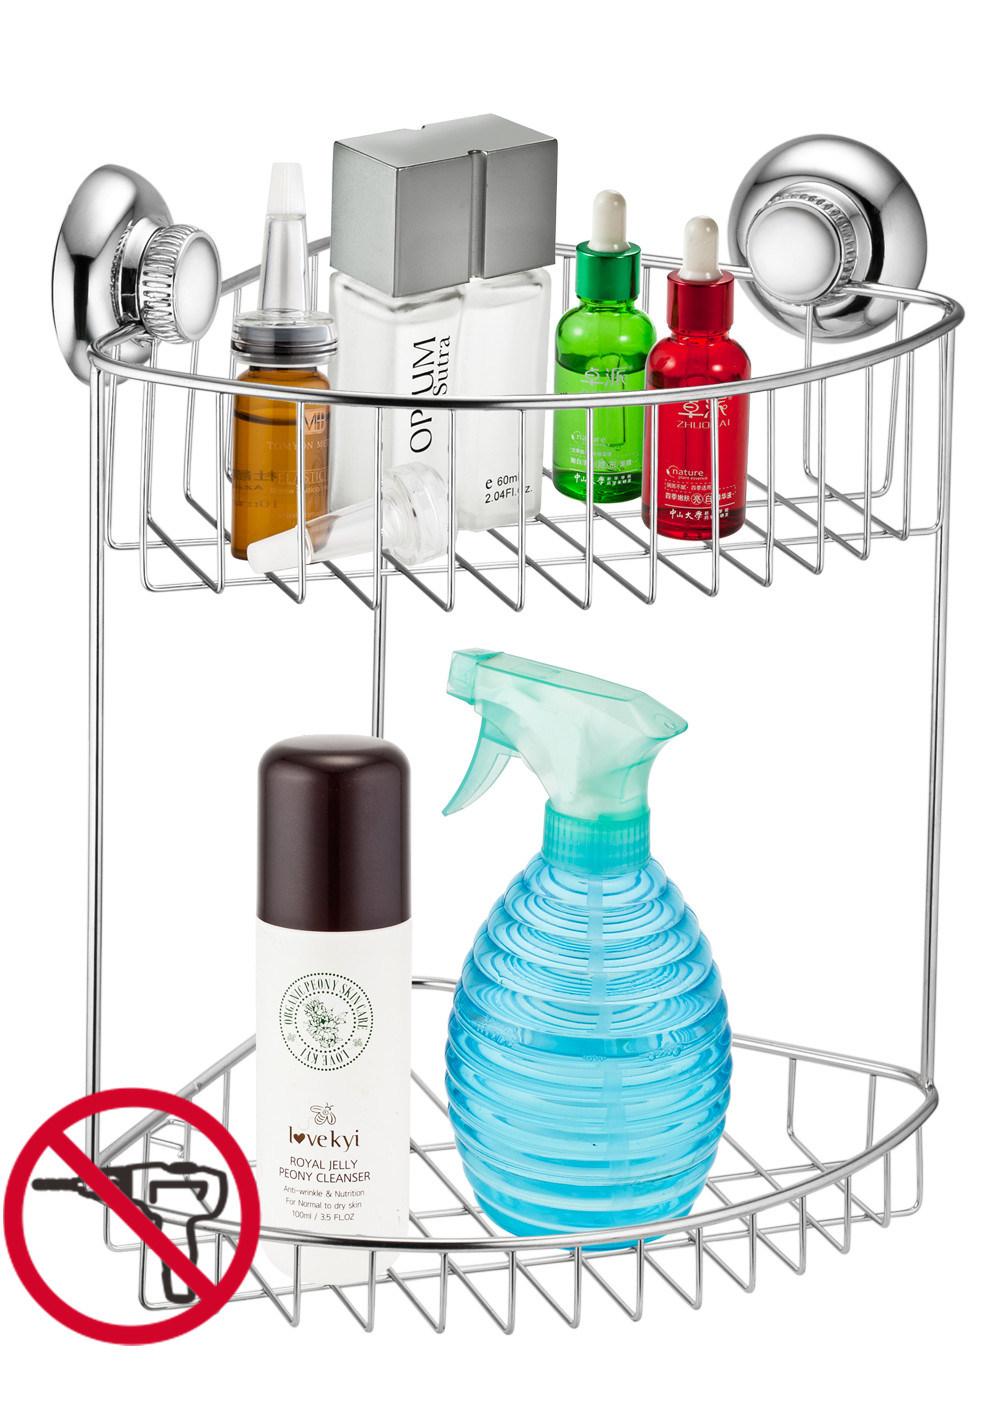 SUS304 Suction Bathroom Shower Corner Storage Shelves for Soap Shampoo Lotion Accessories